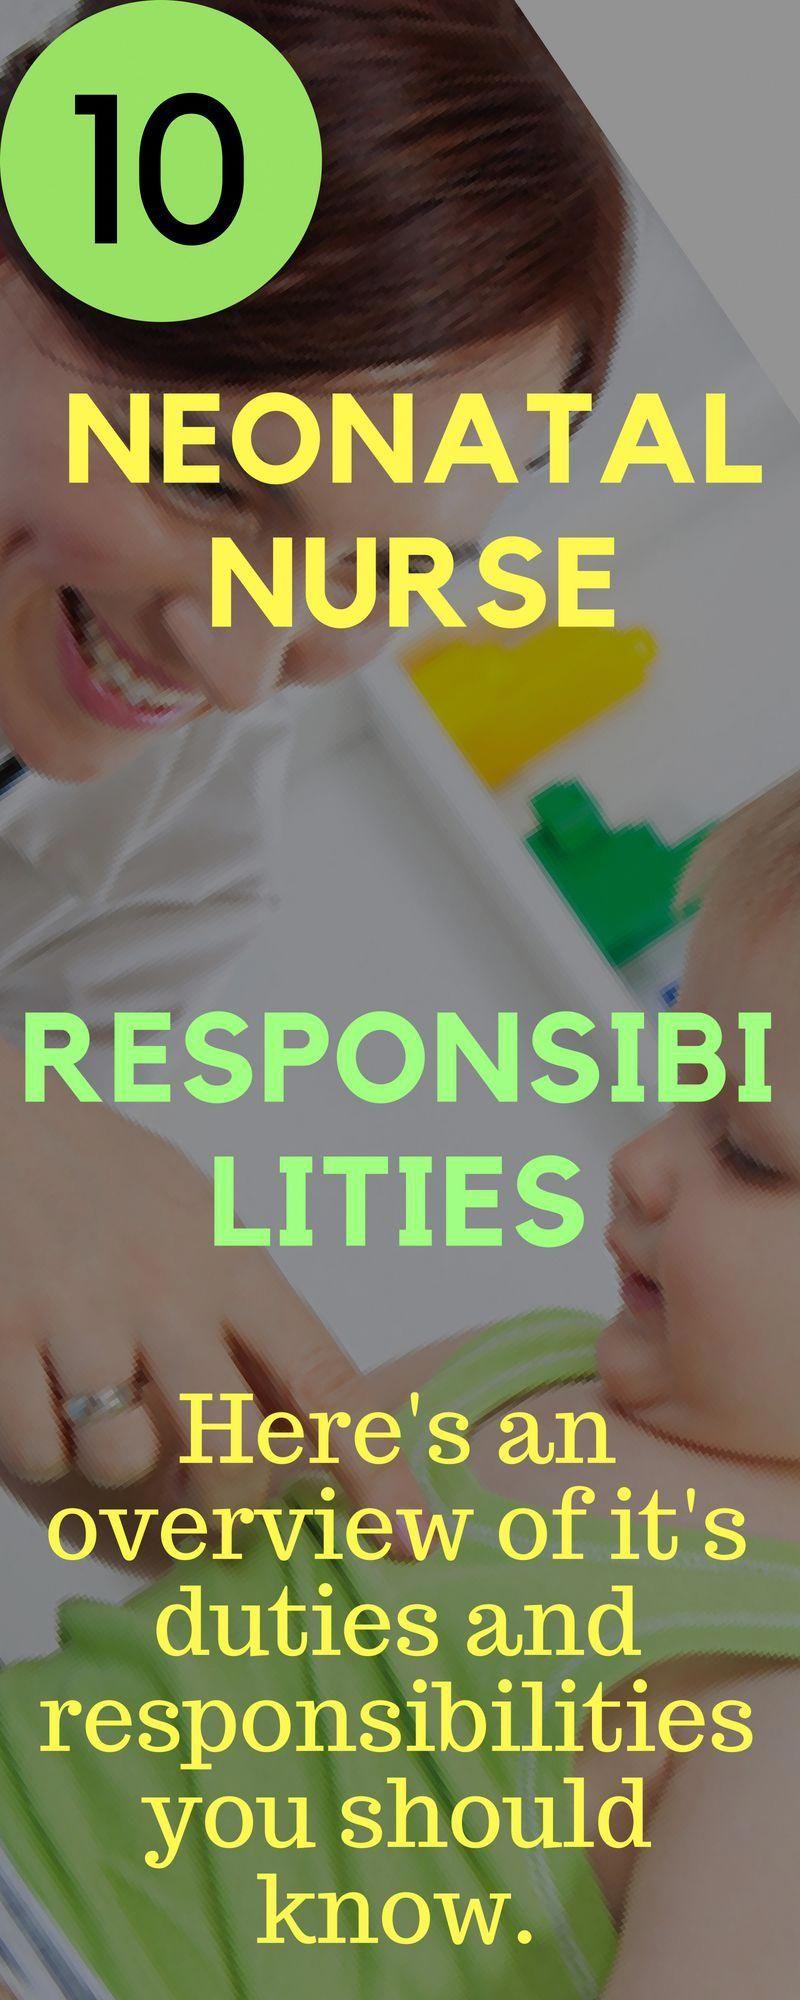 How To Become A Neonatal Nurse Or Nursery Salary Job Description And Career Nursepractitionerschooling